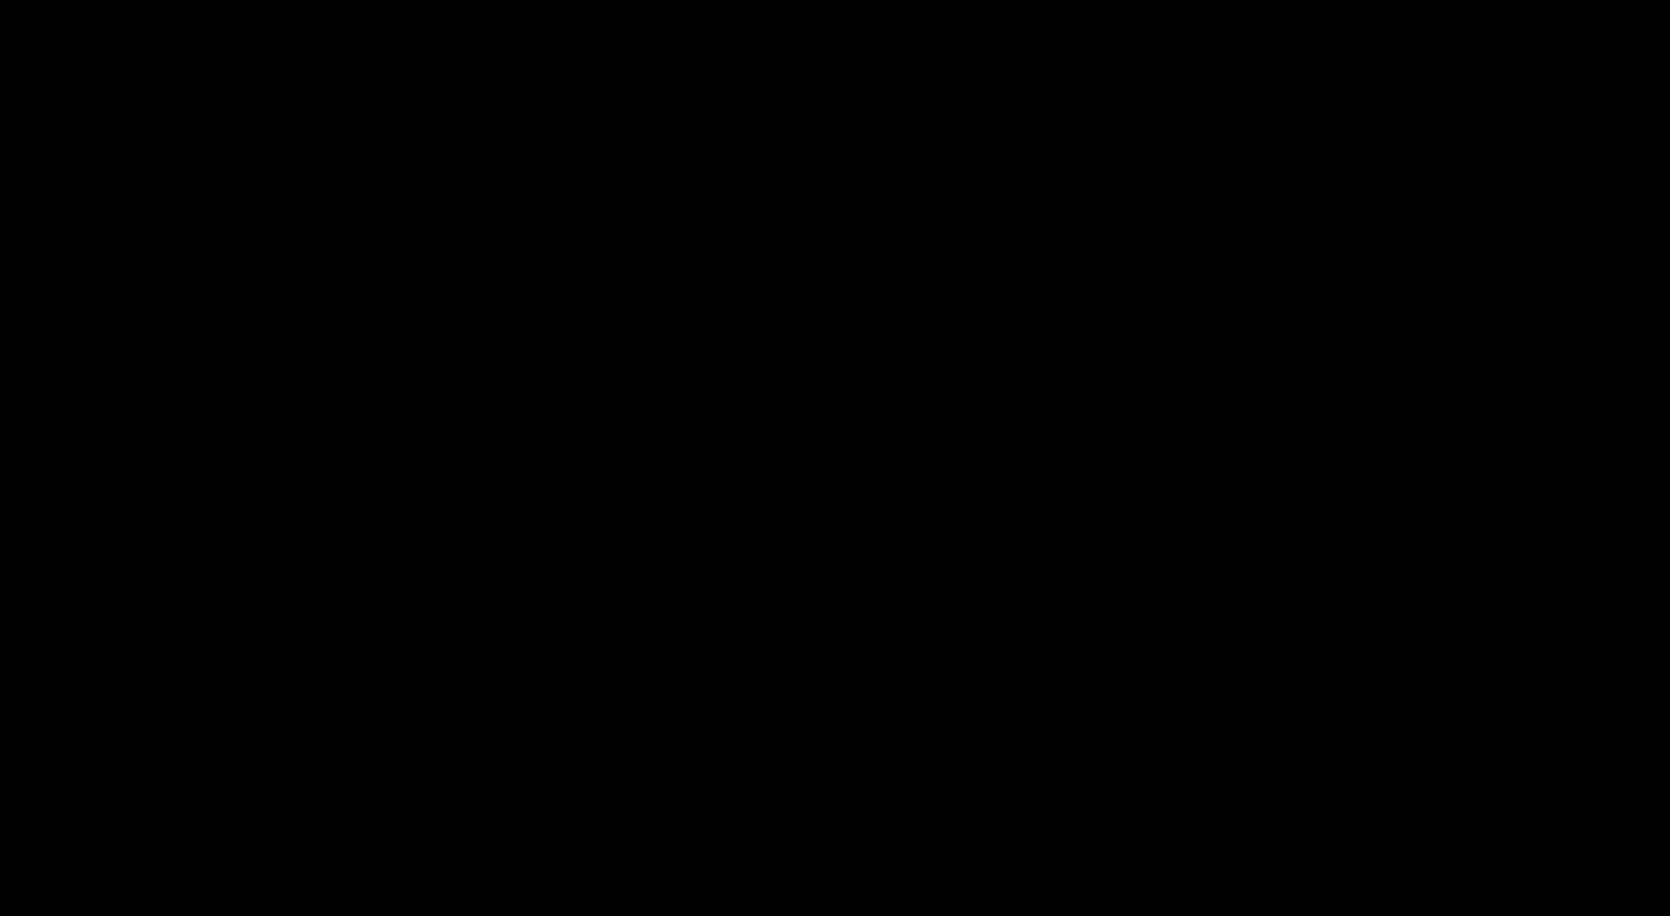 5-Bromo-4-chloro-3-indolyl α-D-N-acetylneuraminic acid